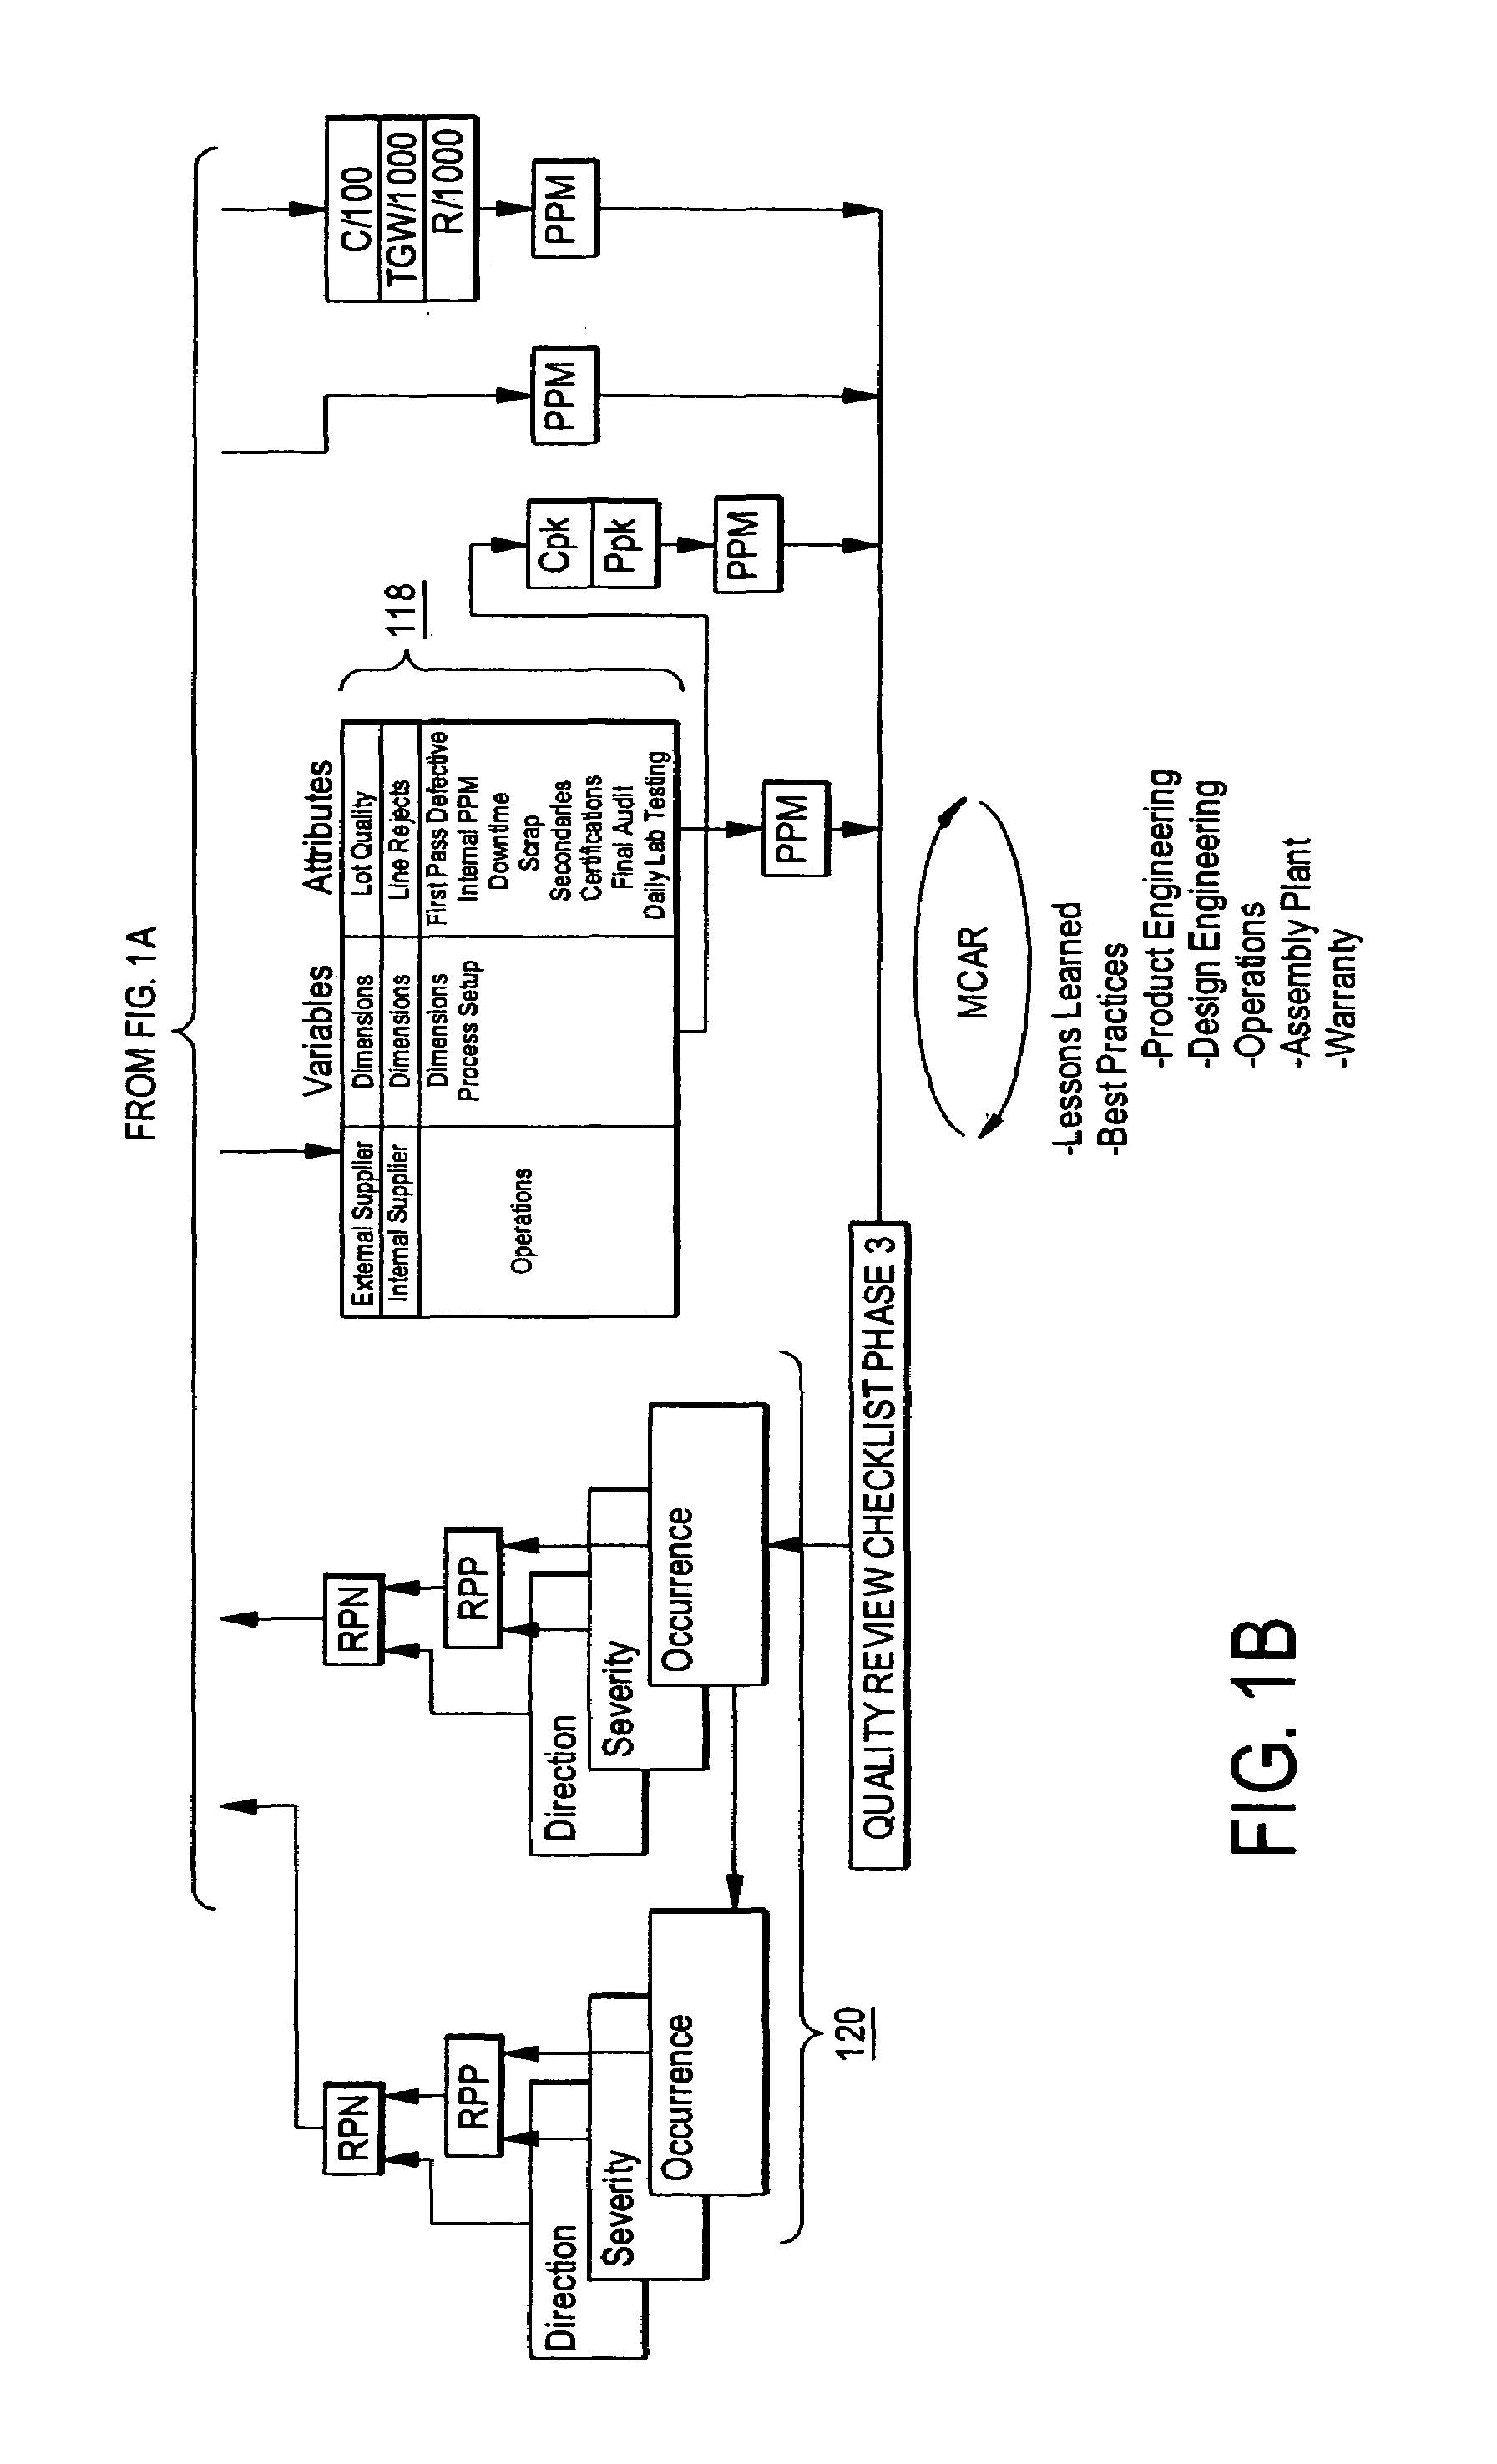 process flow diagram format as per aiag